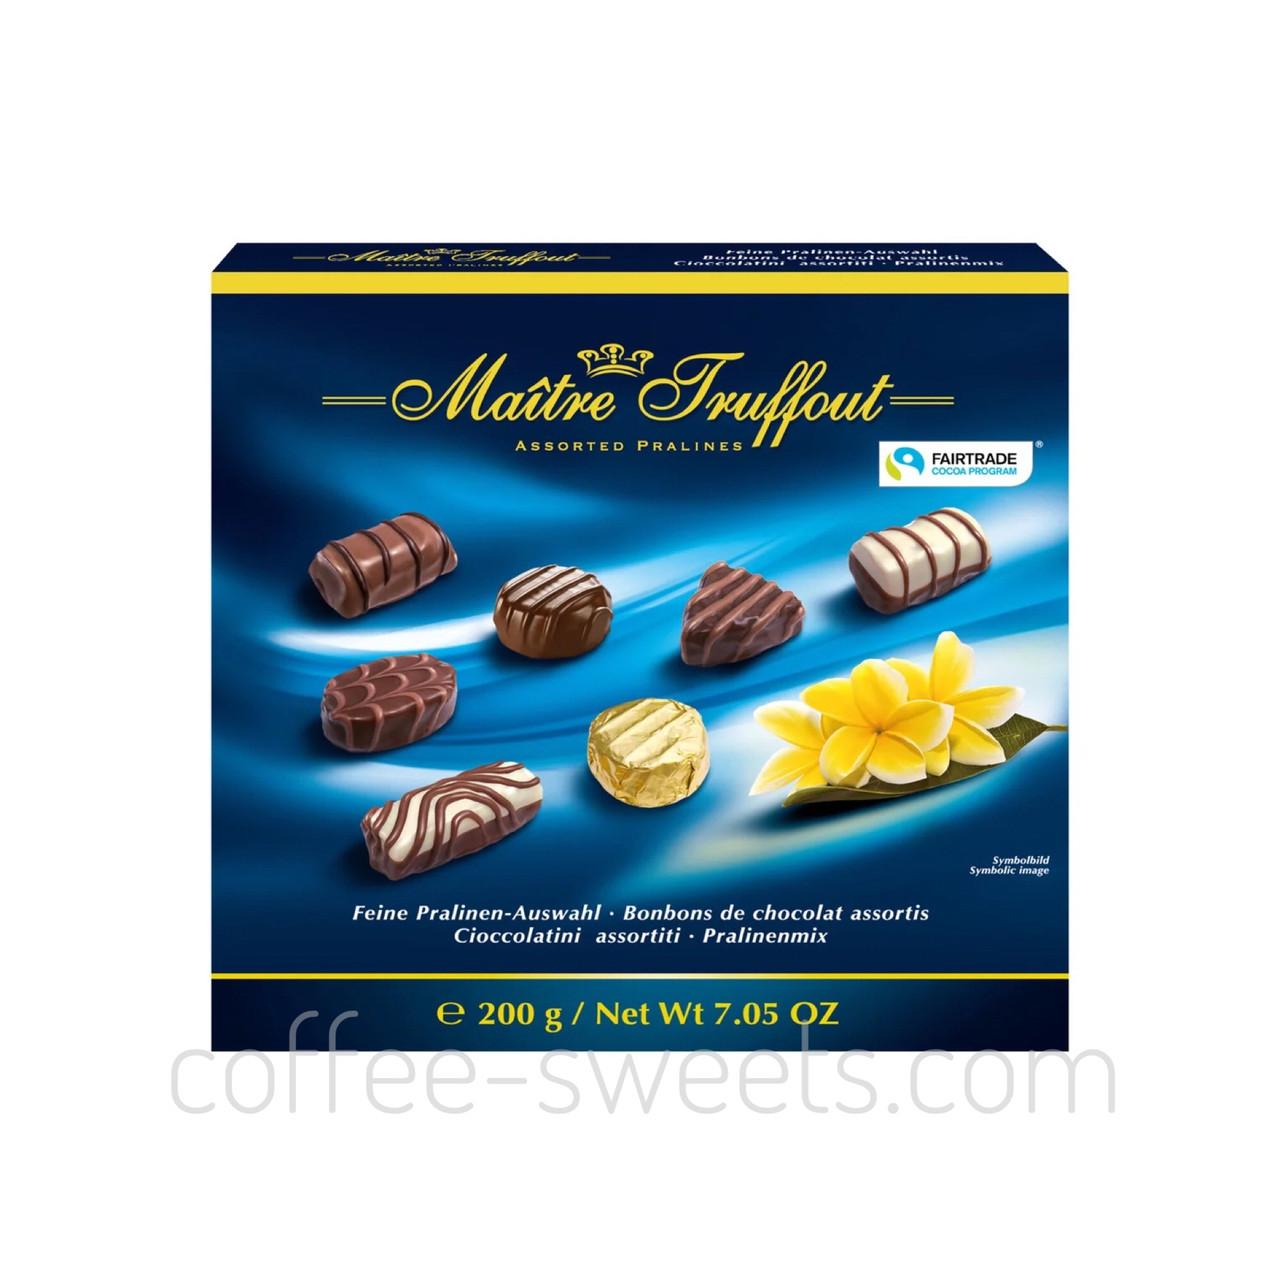 Шоколадные конфеты Maitre Truffout Assorted Pralines с пралине, 200 гр